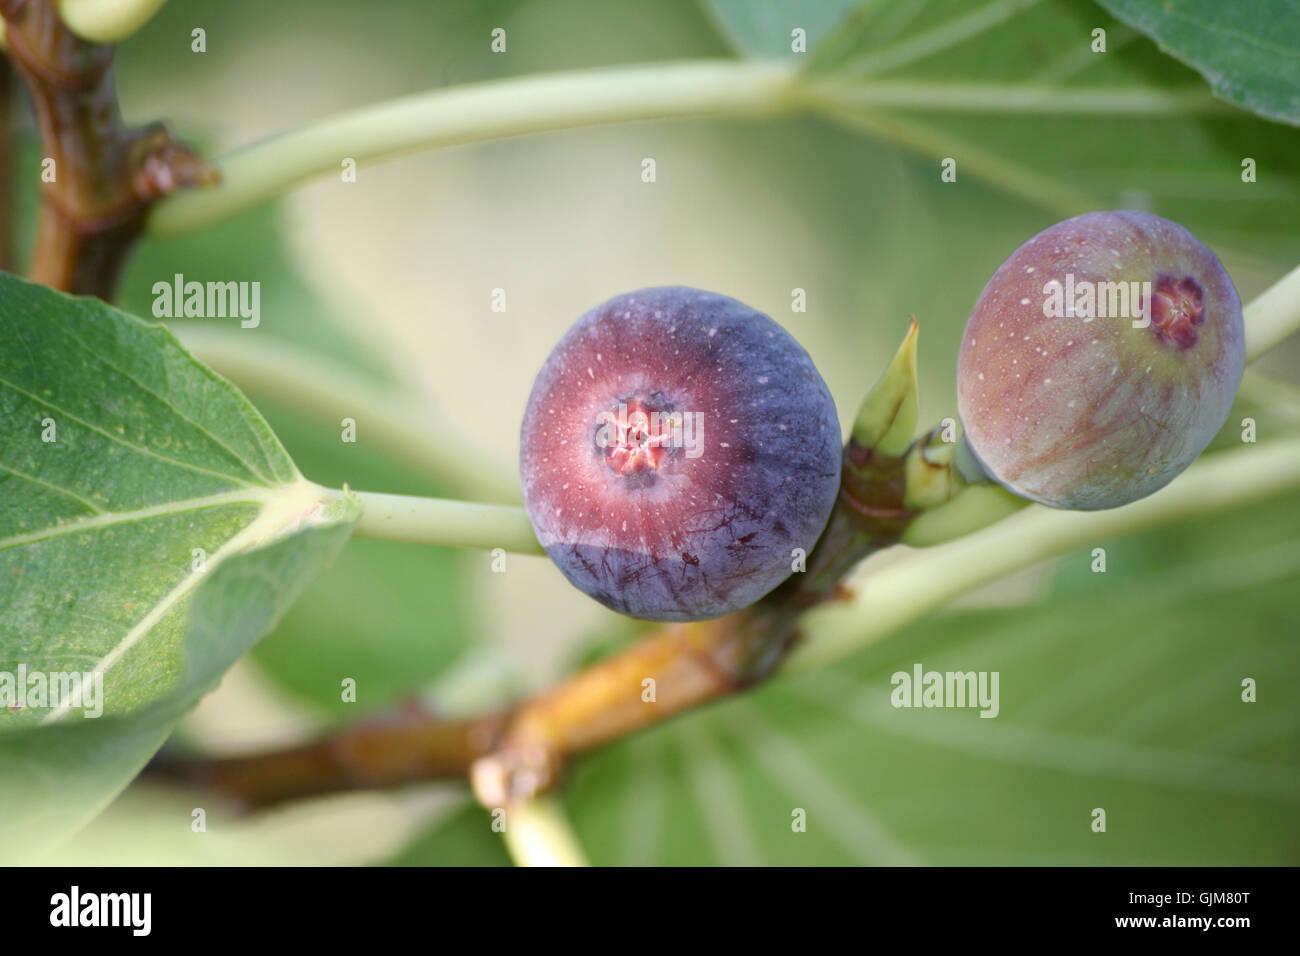 fruit mediterran figs - Stock Image